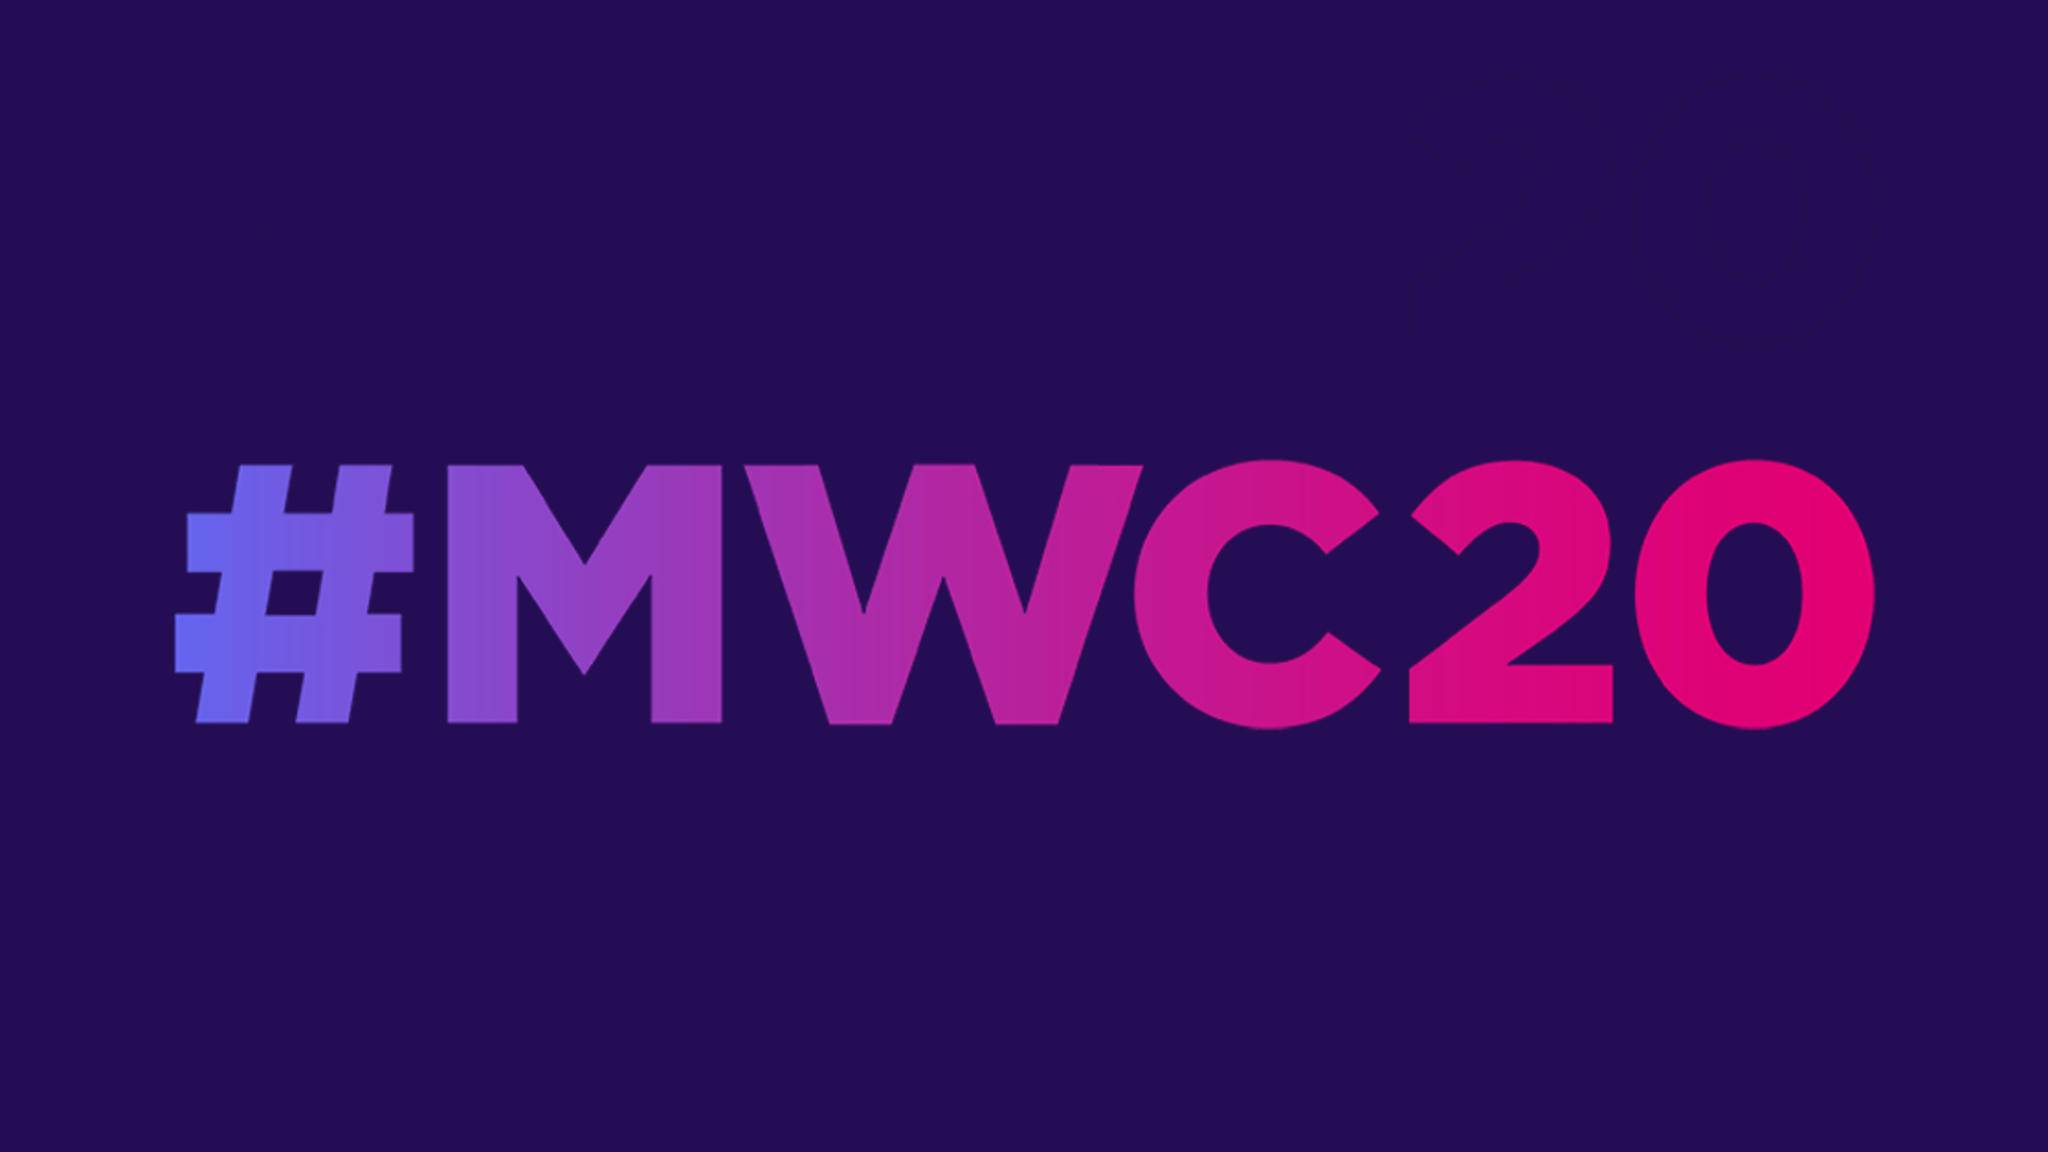 mwc-2020-logo